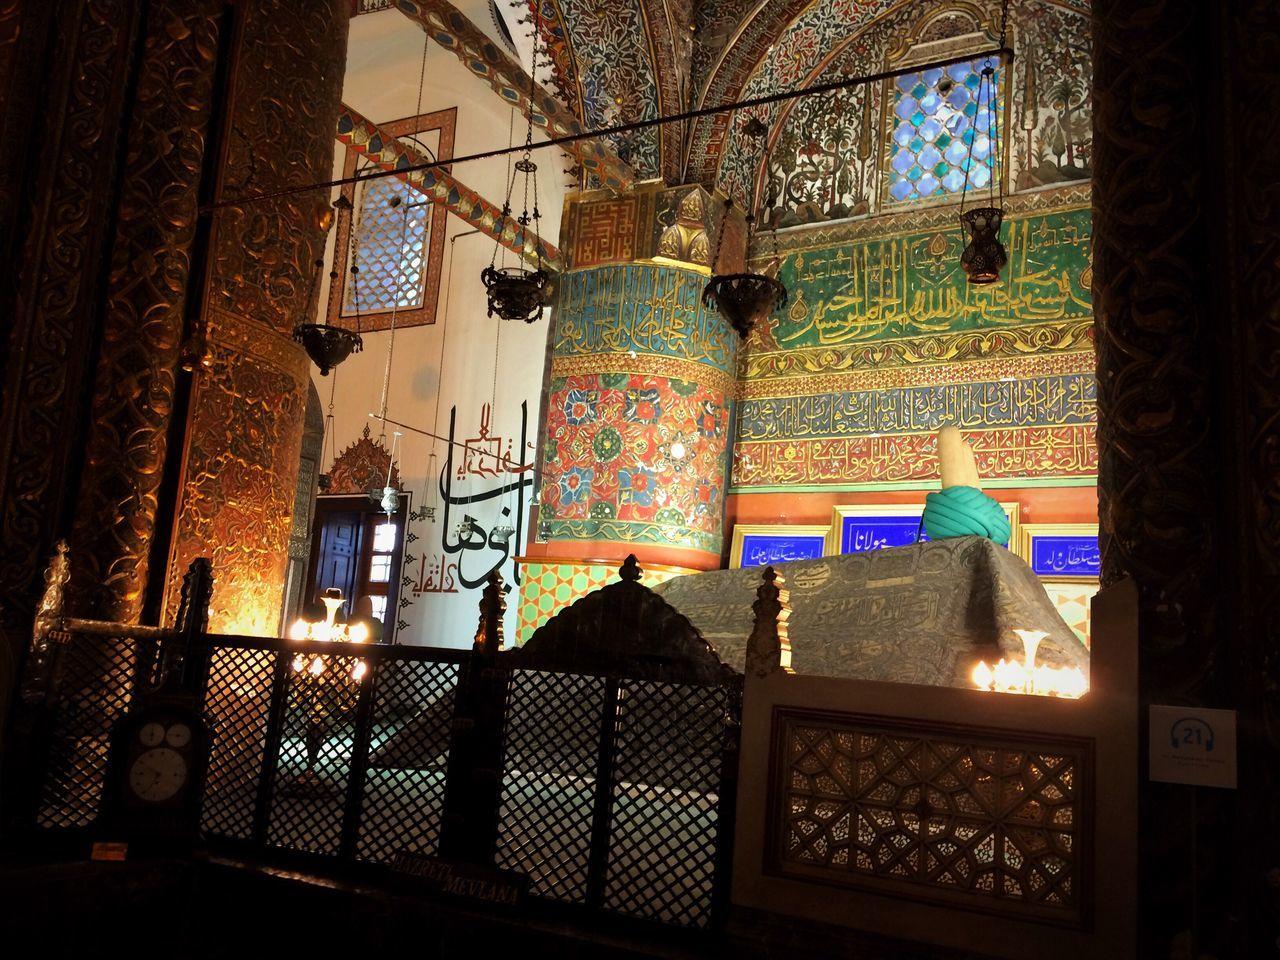 Mosque Retro Rear View No People History Konya Turkey Turkey Konya Mevlana Mosque Mevlana Türbesi Love ♥ Vintage Elégance City